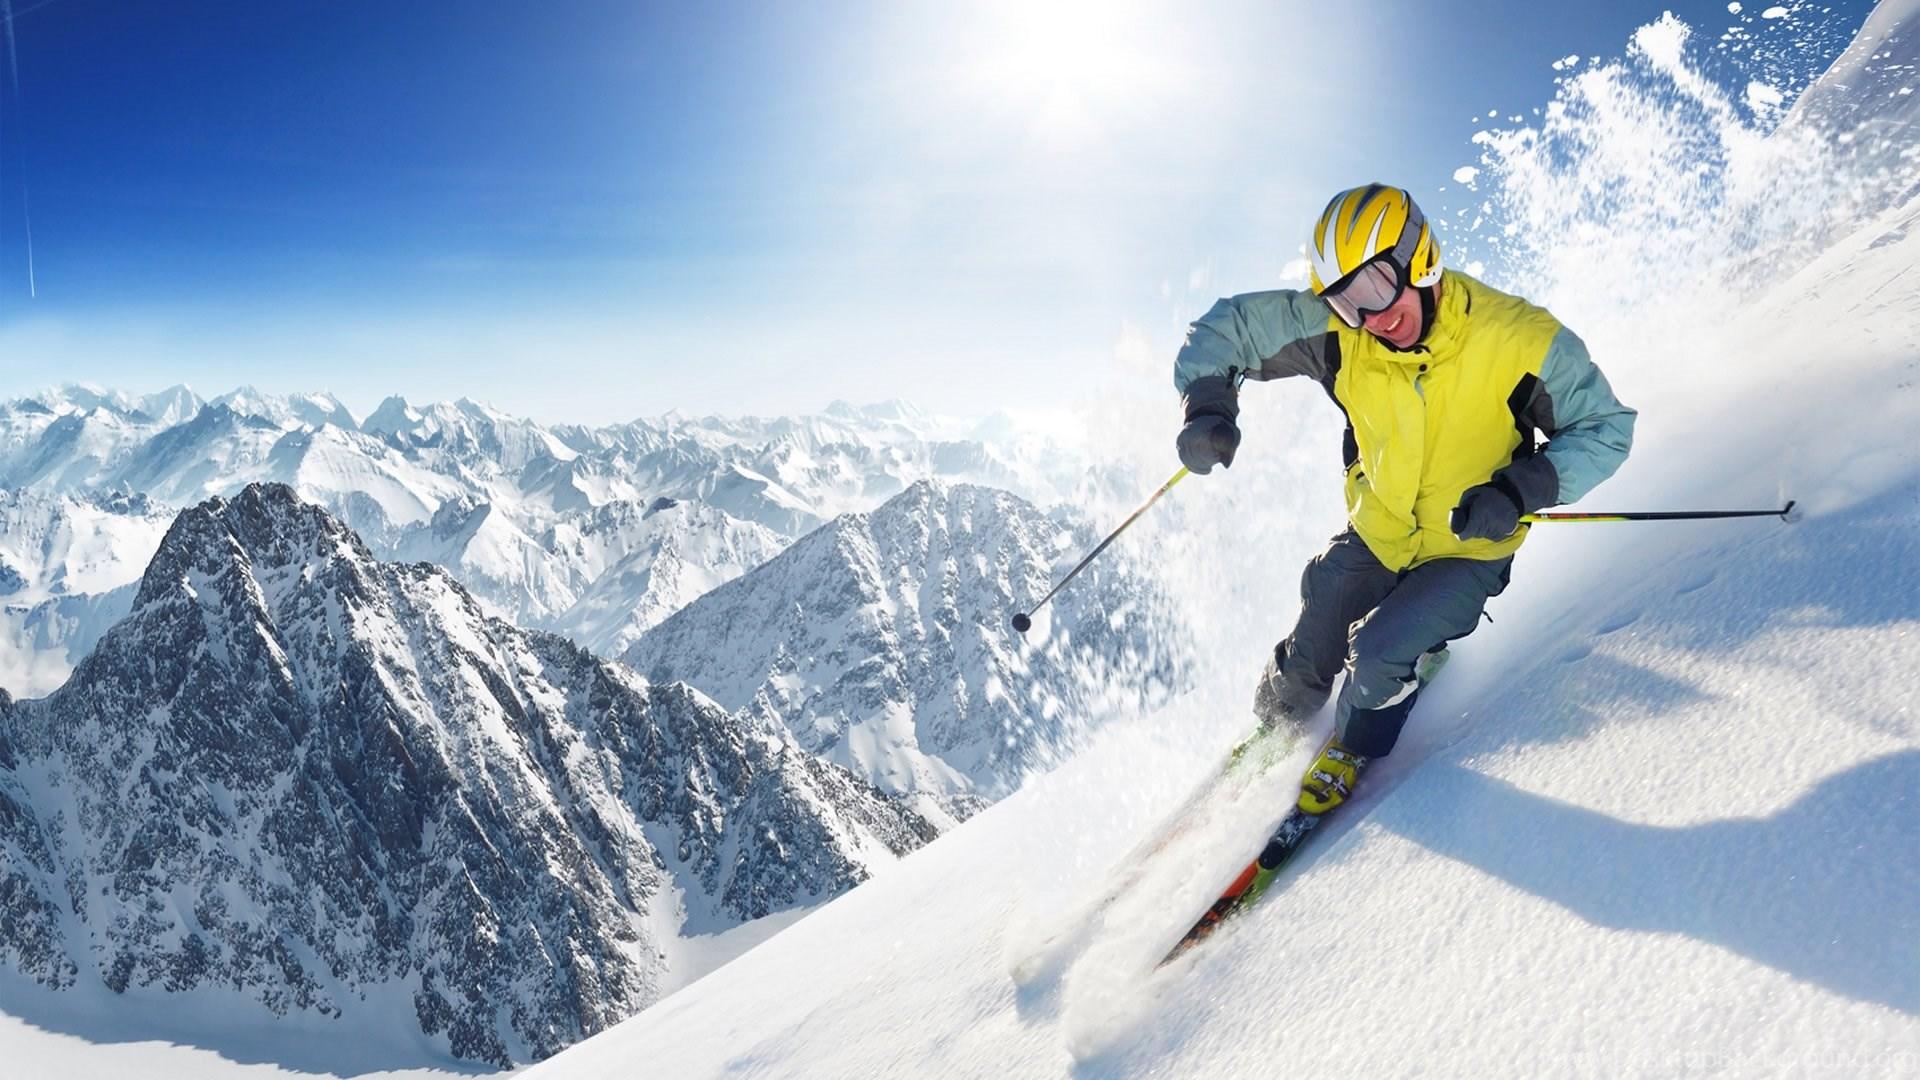 ski wallpapers desktop background